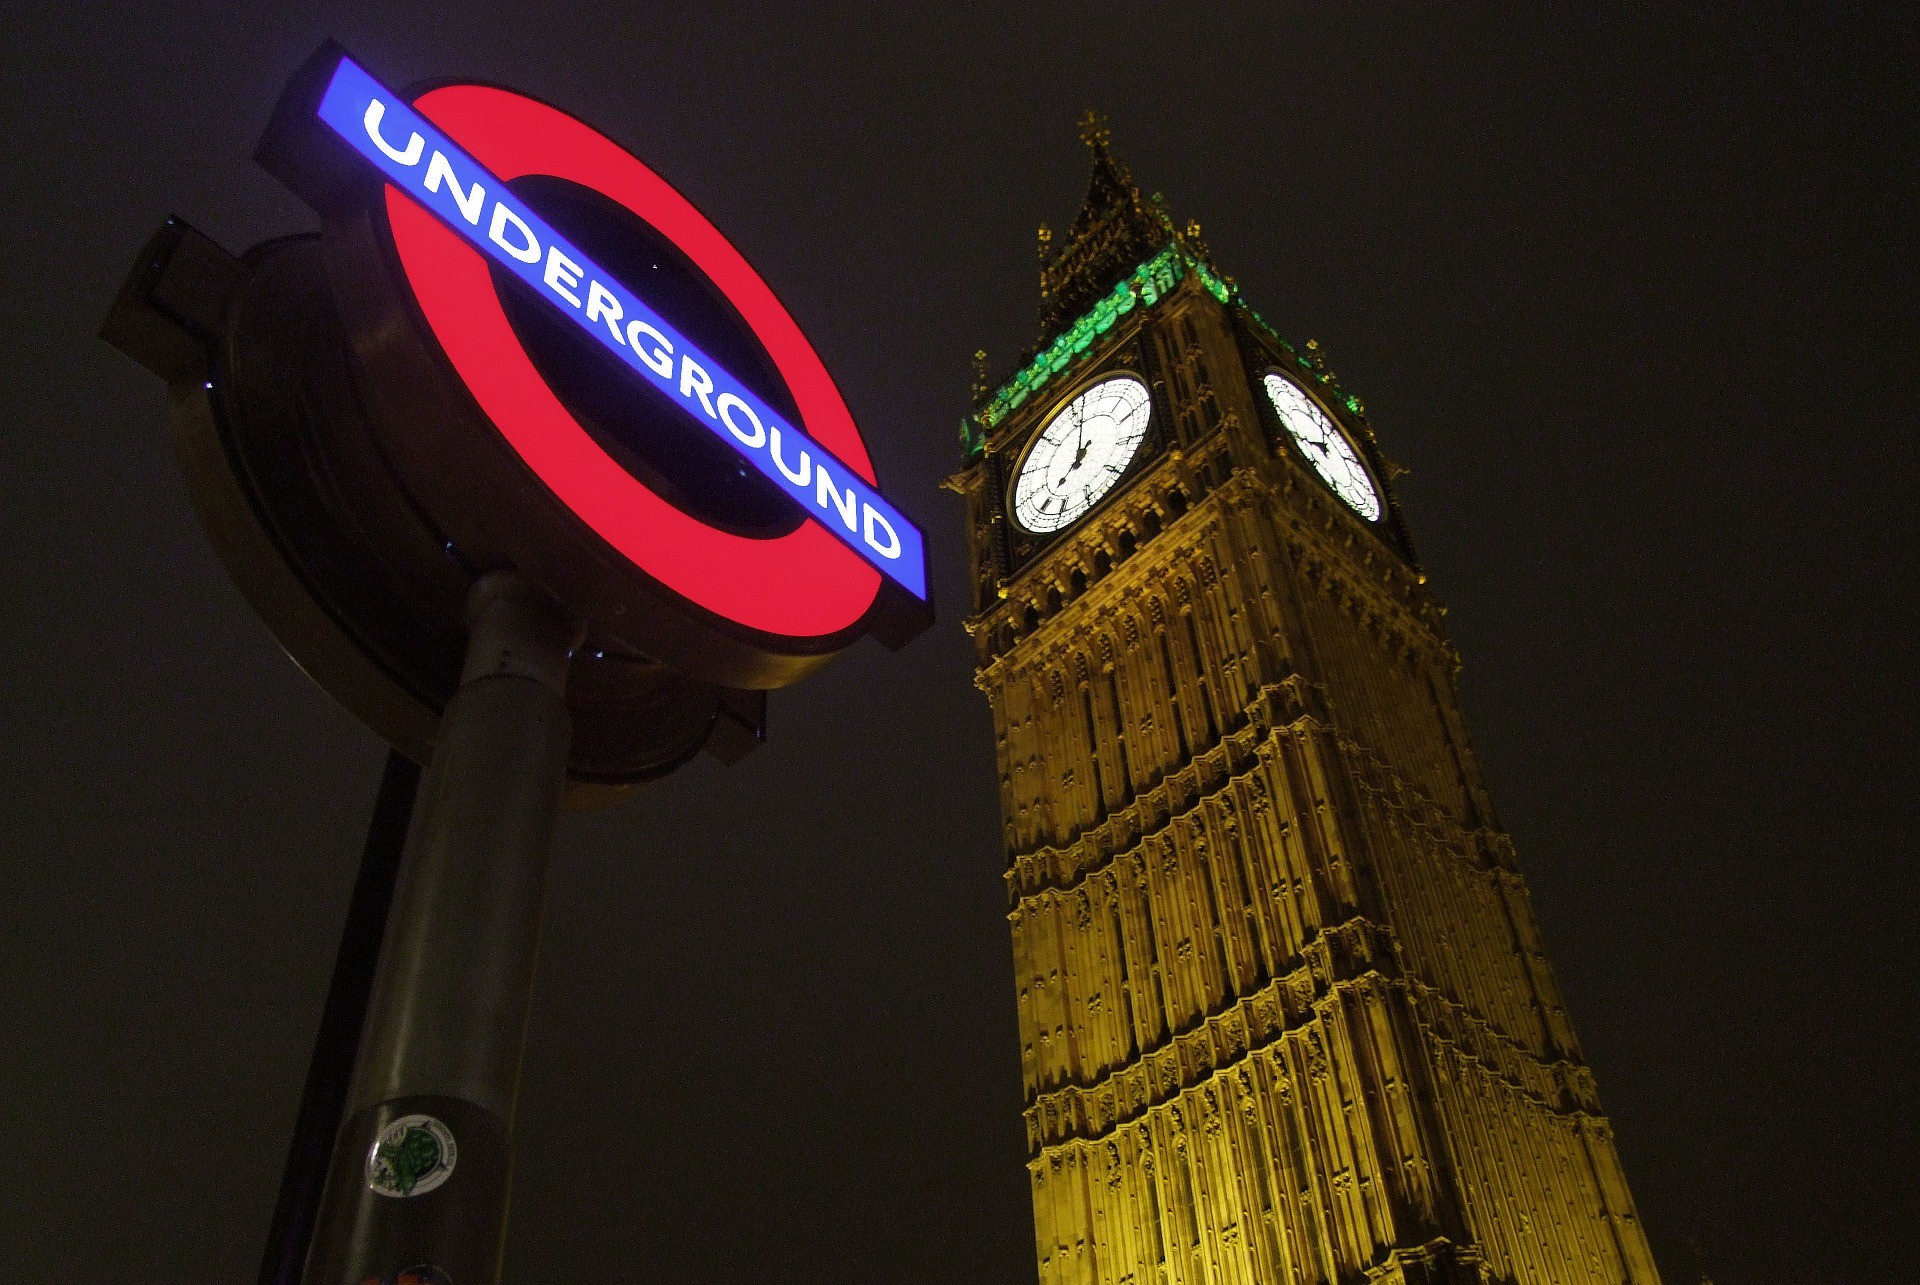 Londonleben